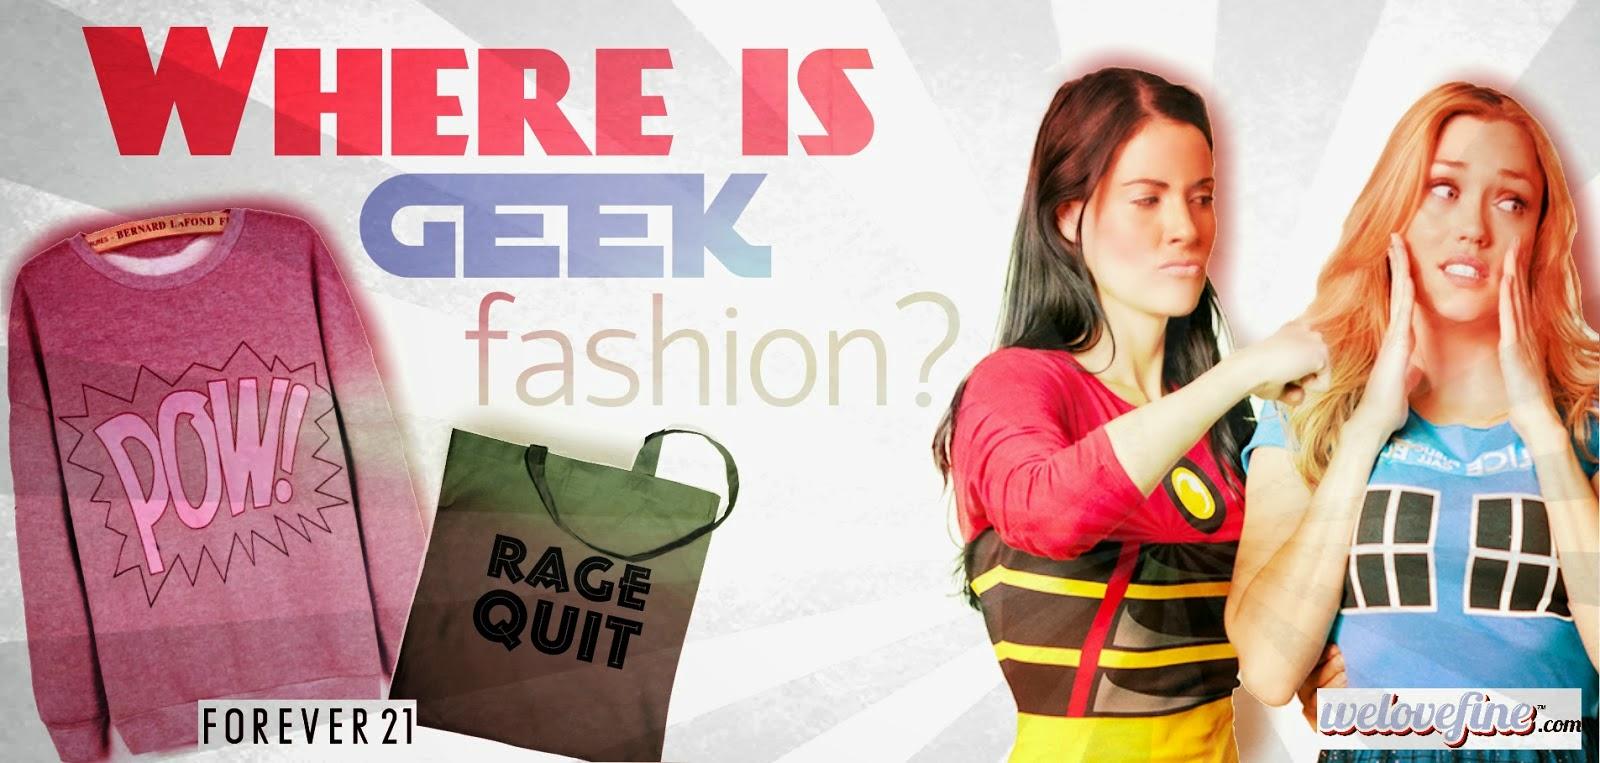 http://kerryshabitat.blogspot.co.uk/2014/01/geek-fashion-forever-21-we-love-fine.html